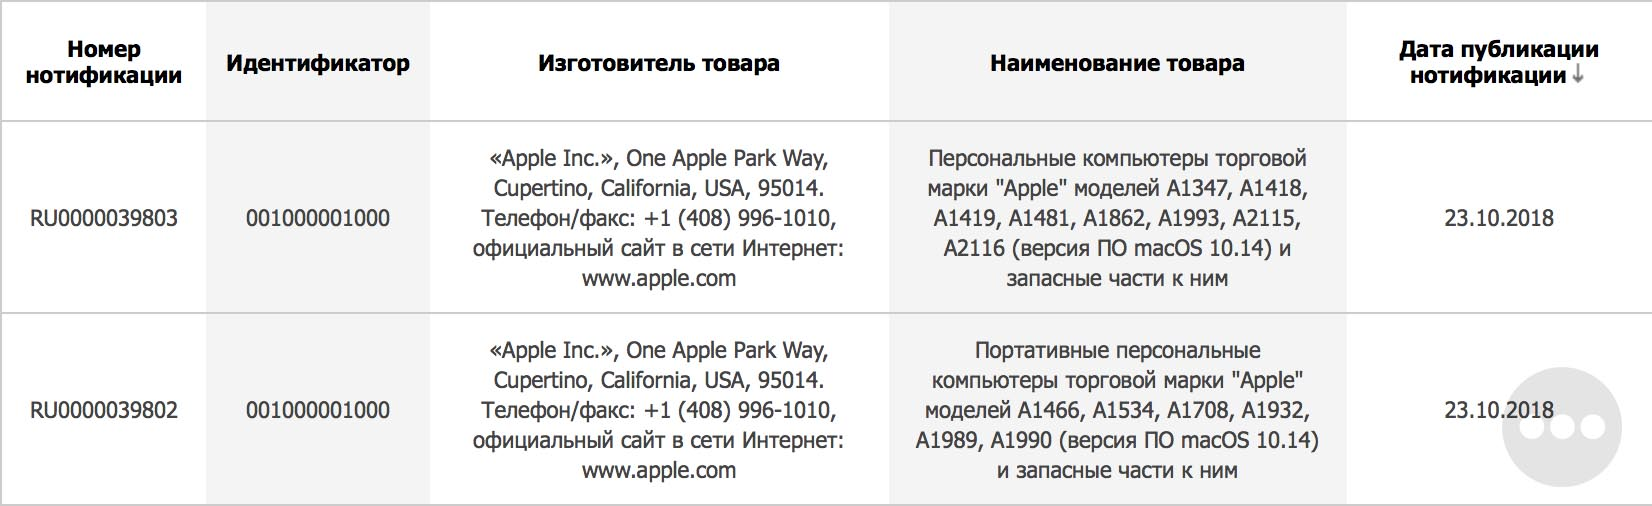 Apple Registers Several New Mac Models in Eurasia Ahead of